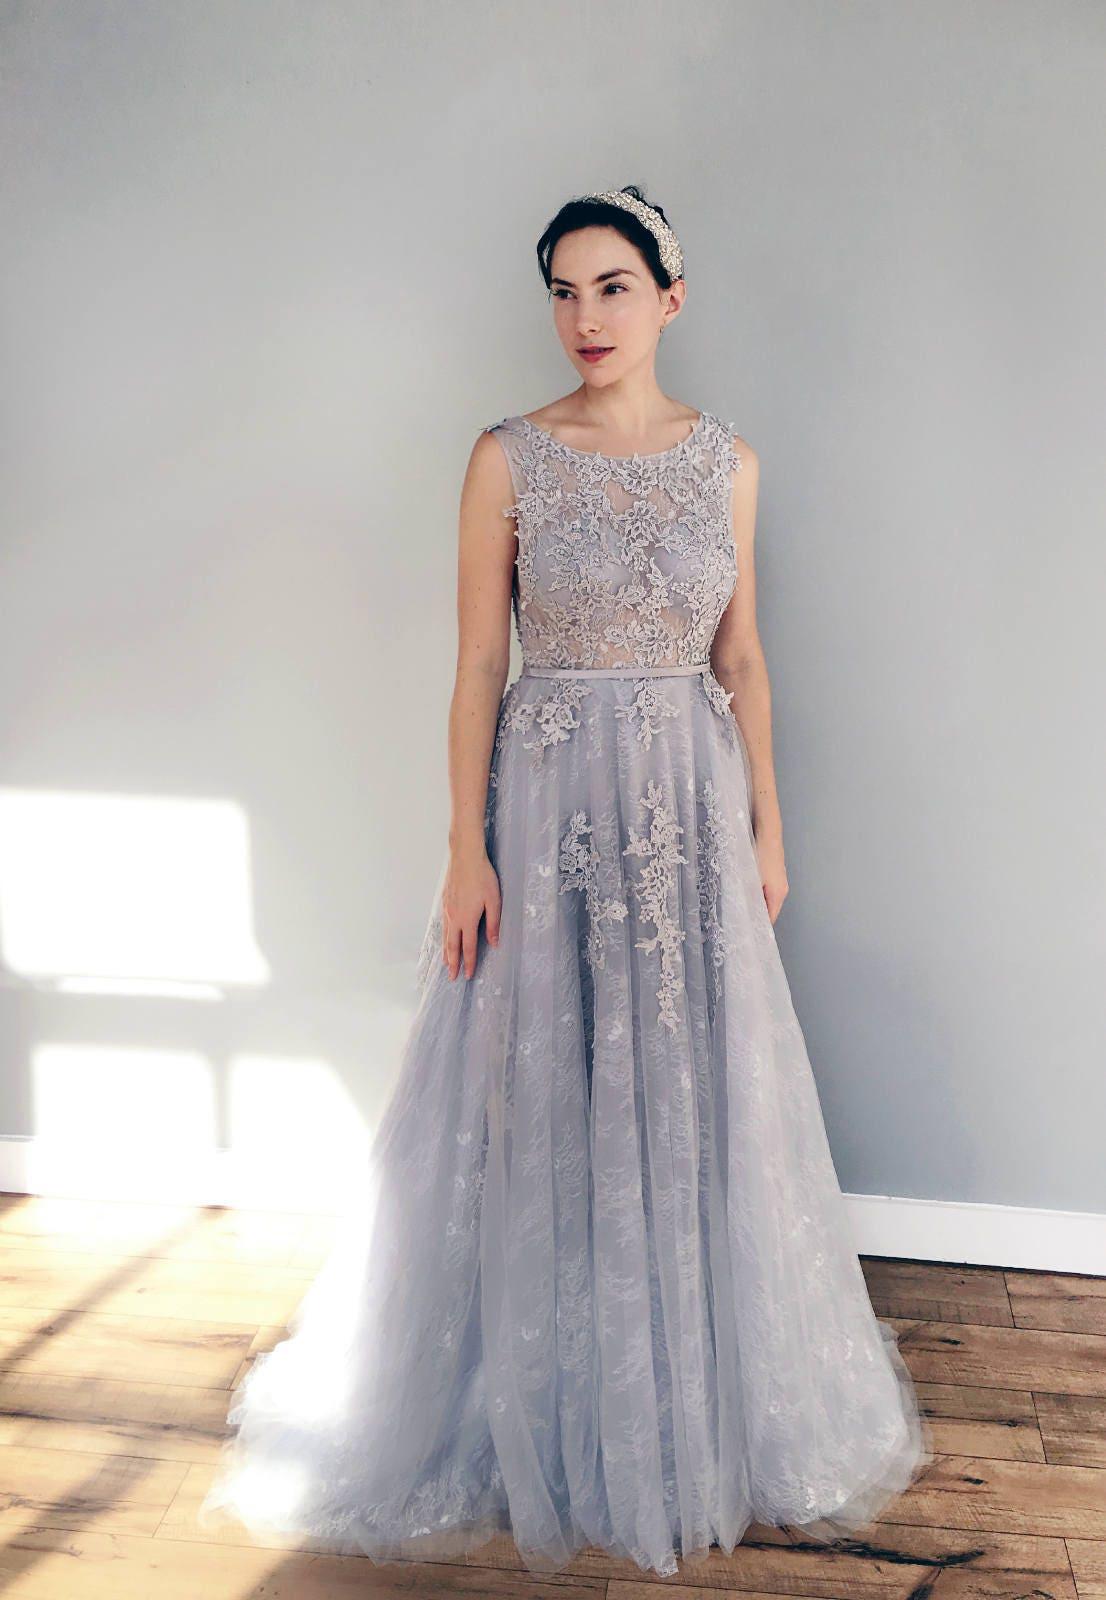 Grau blau Spitze Brautkleid